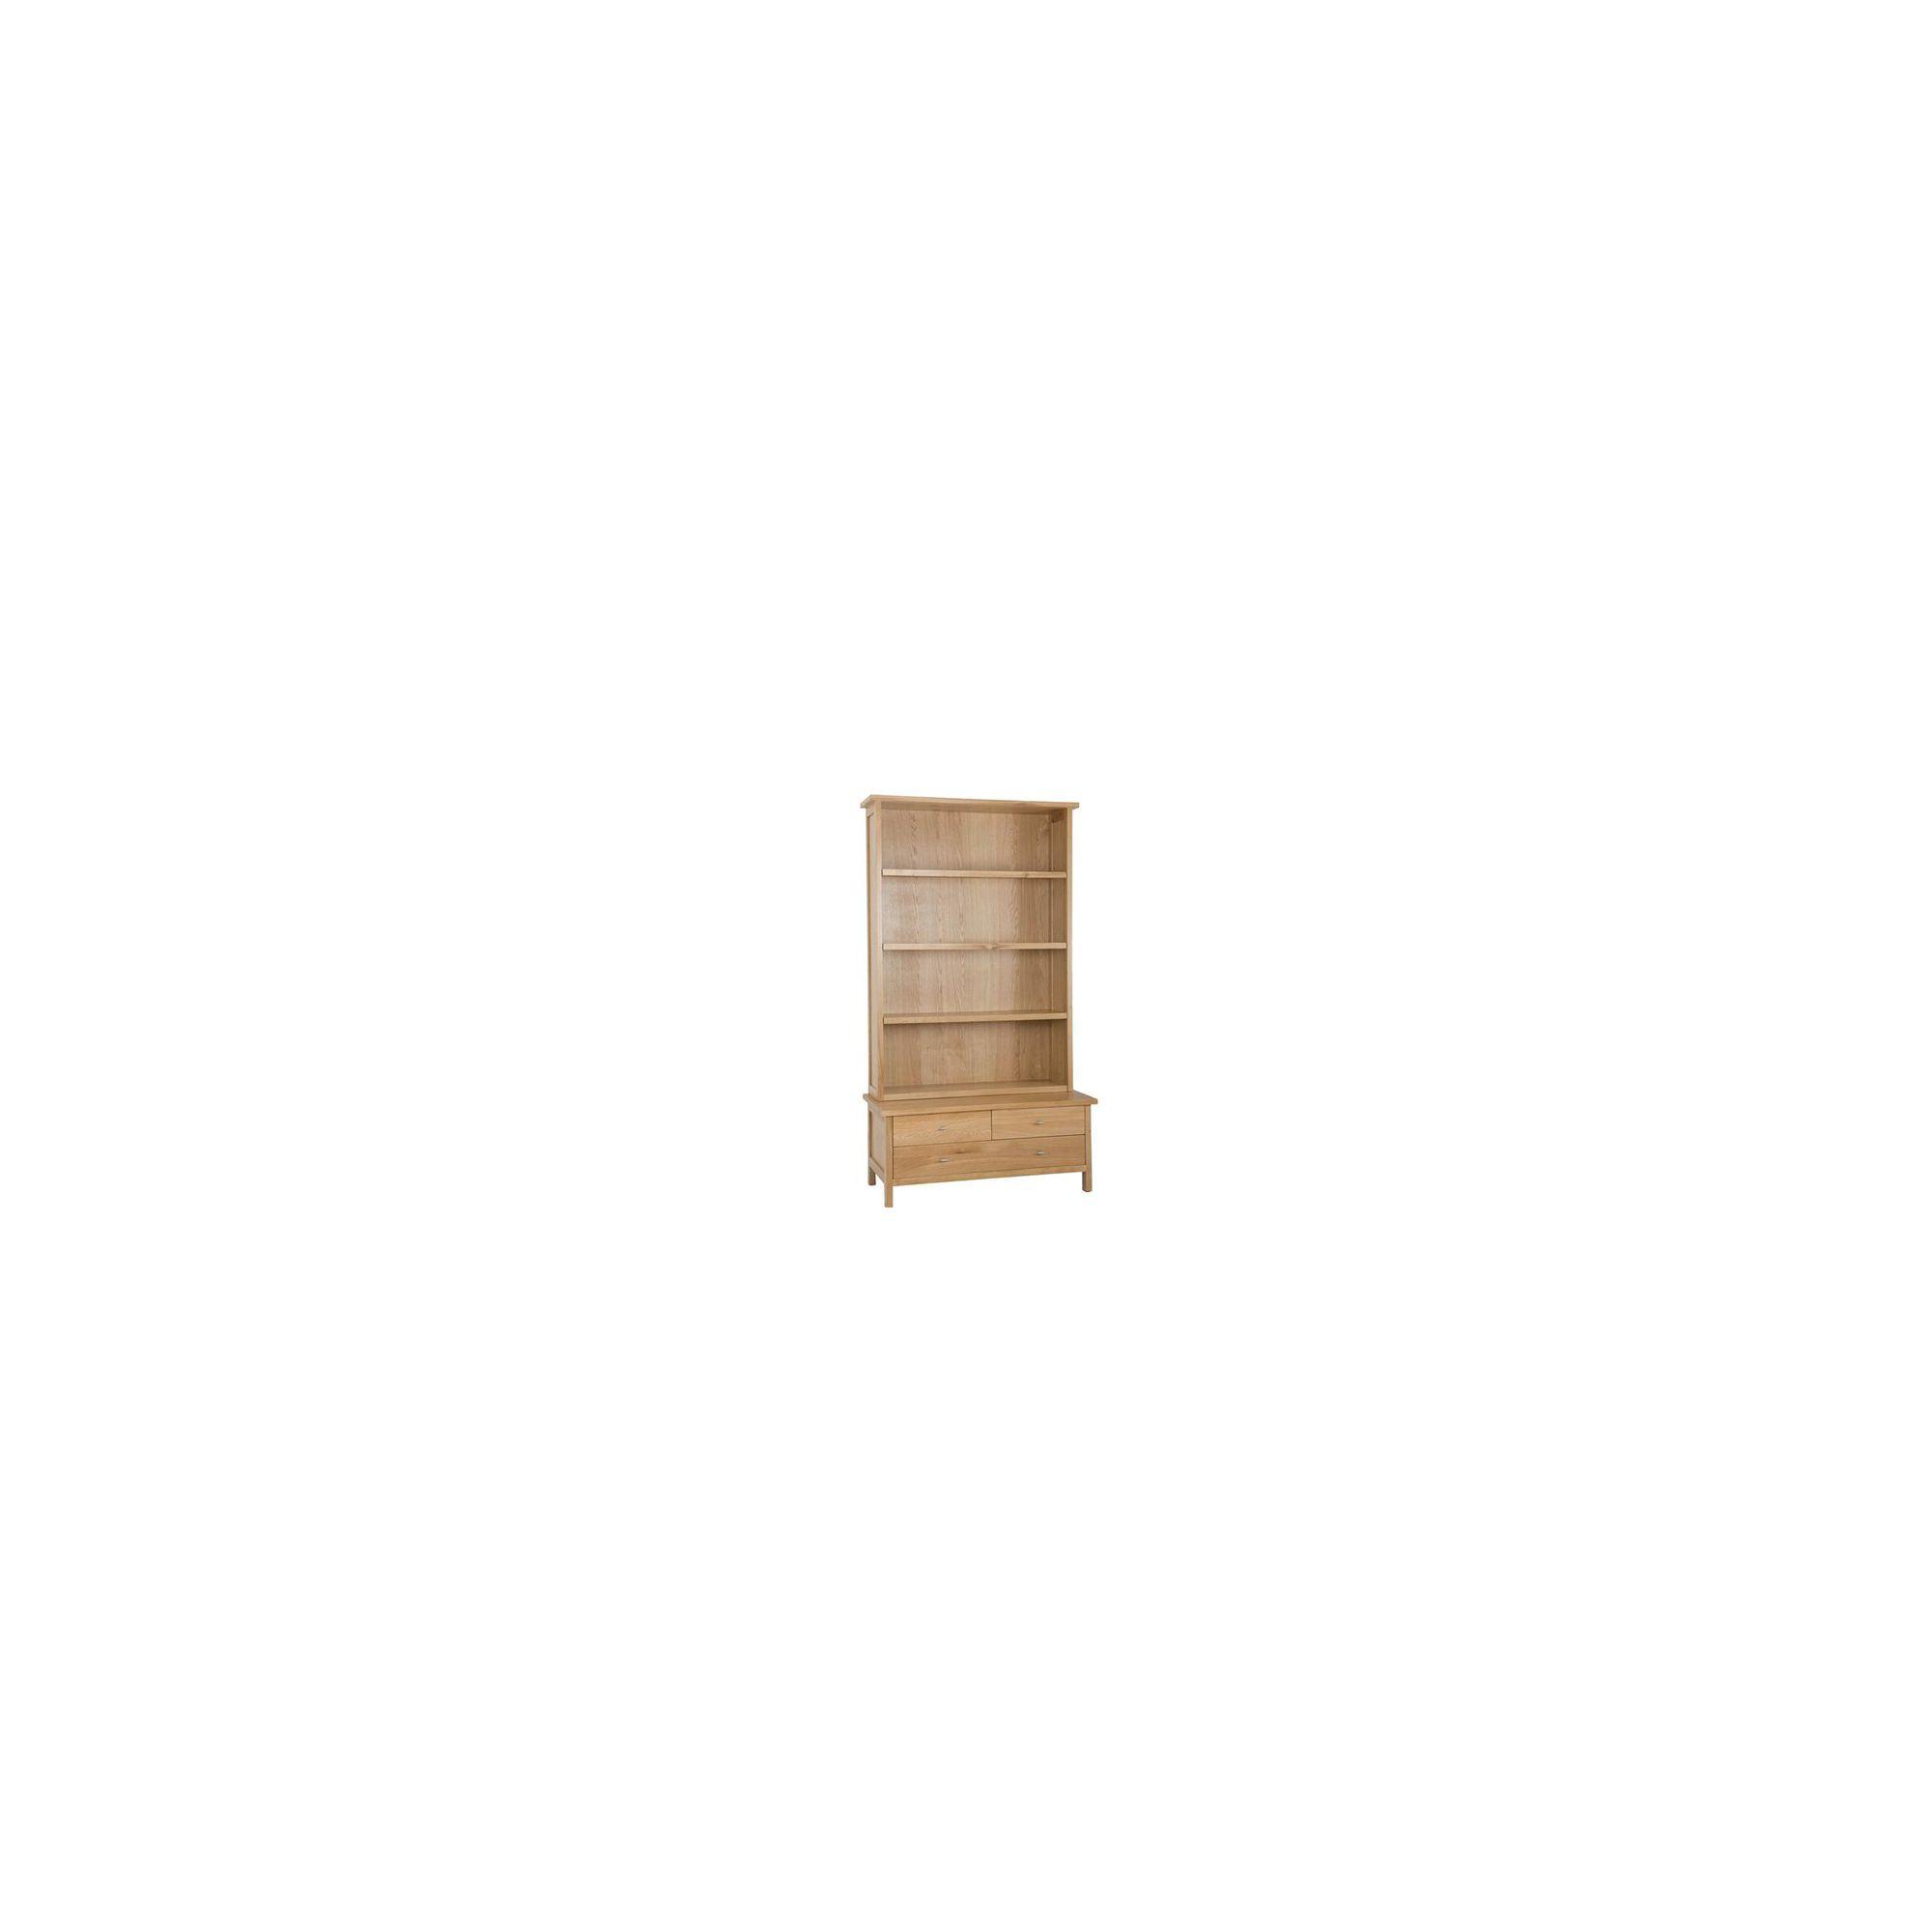 Oakinsen Balmain Two Piece Bookcase at Tescos Direct